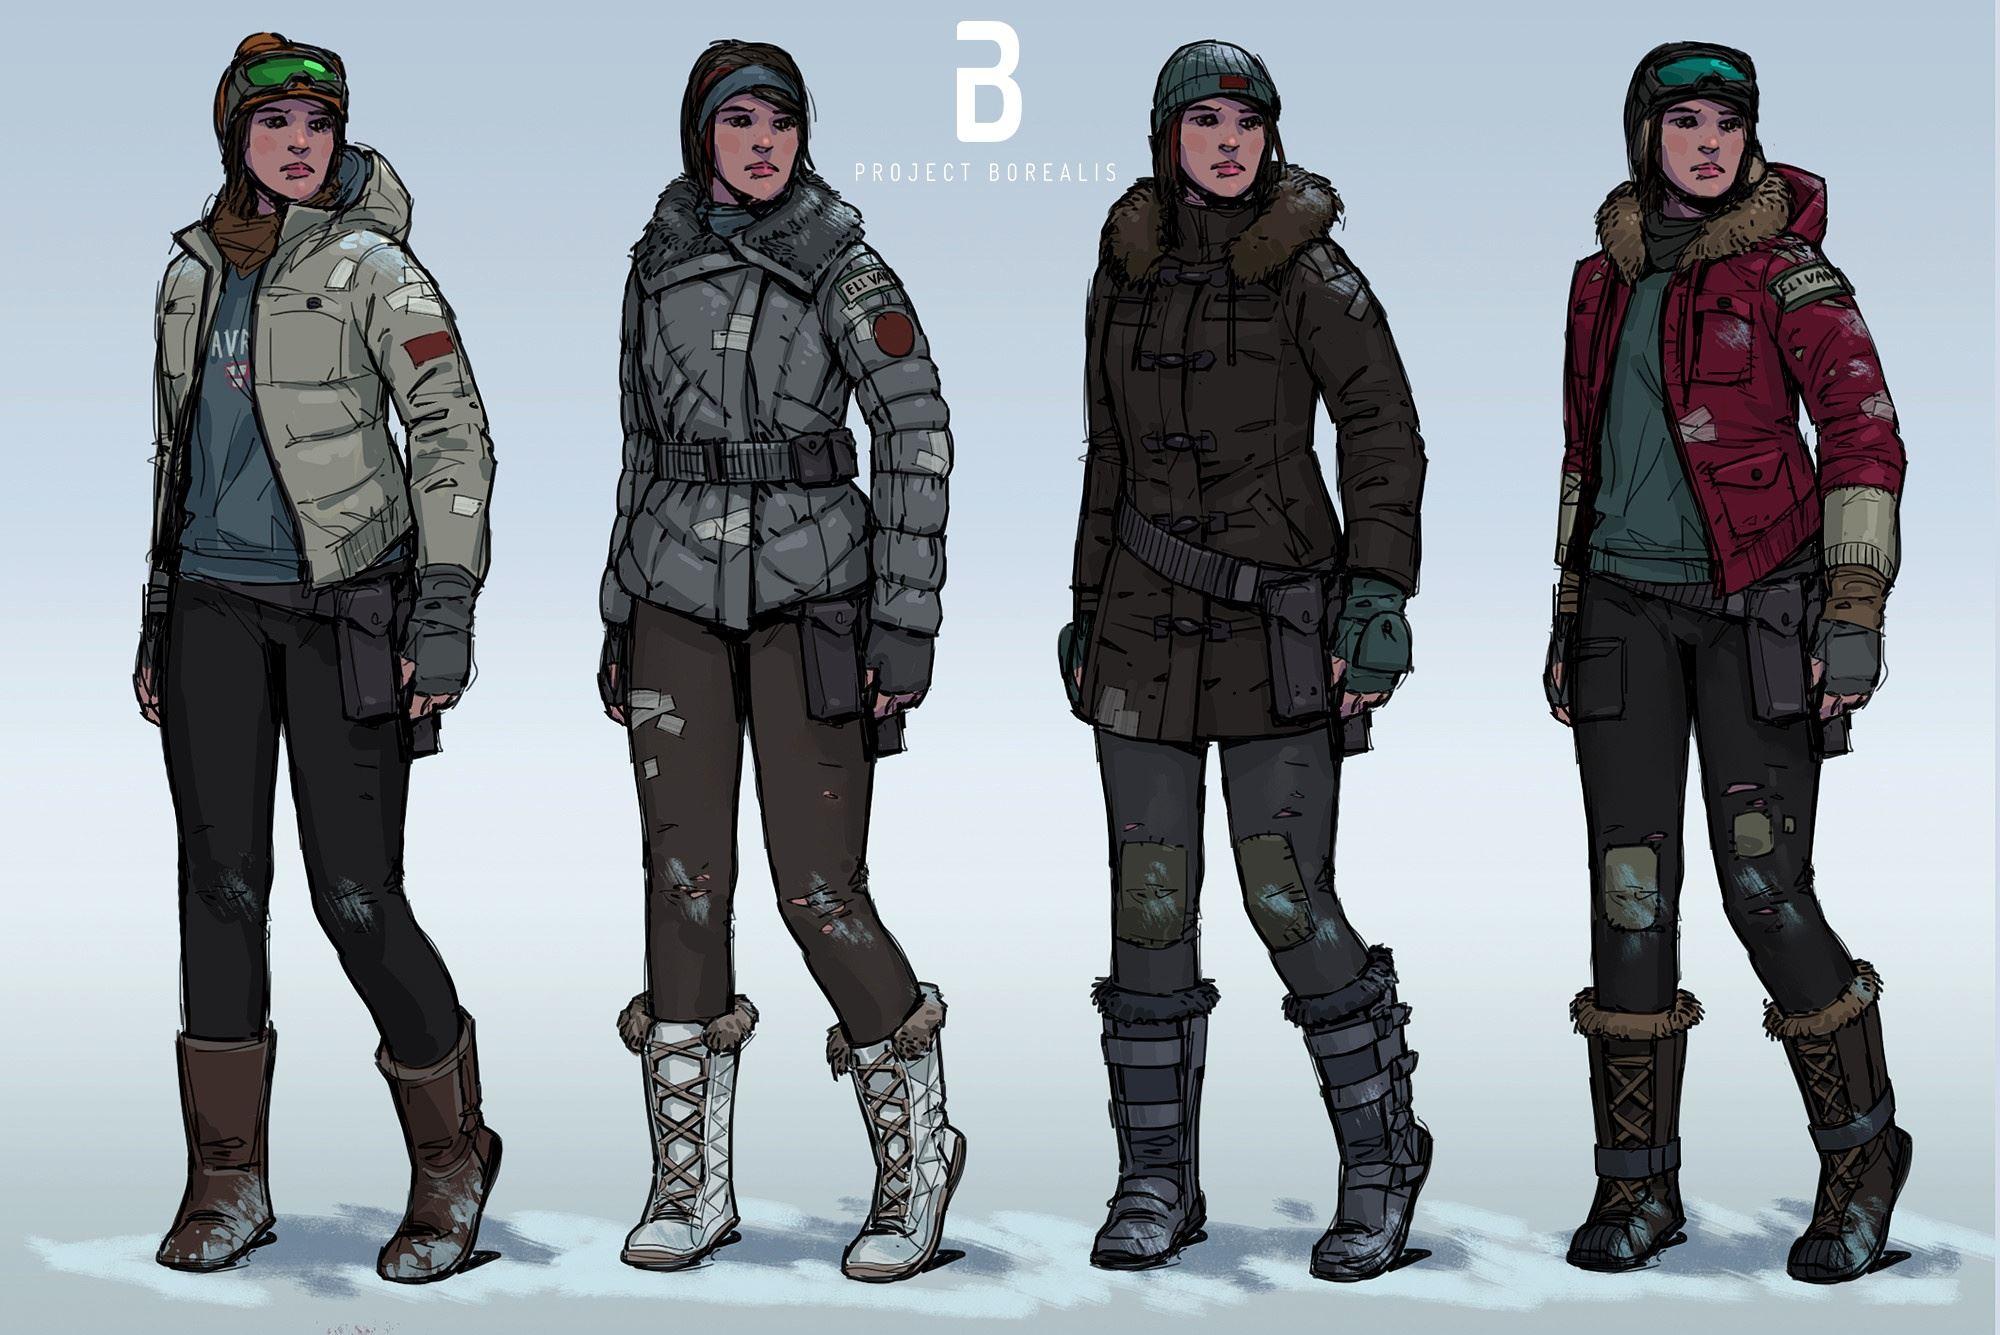 Project Borealis (Half-life 2: Episode 3) - Half-Life 2 Арт, Марк Лэйдлоу